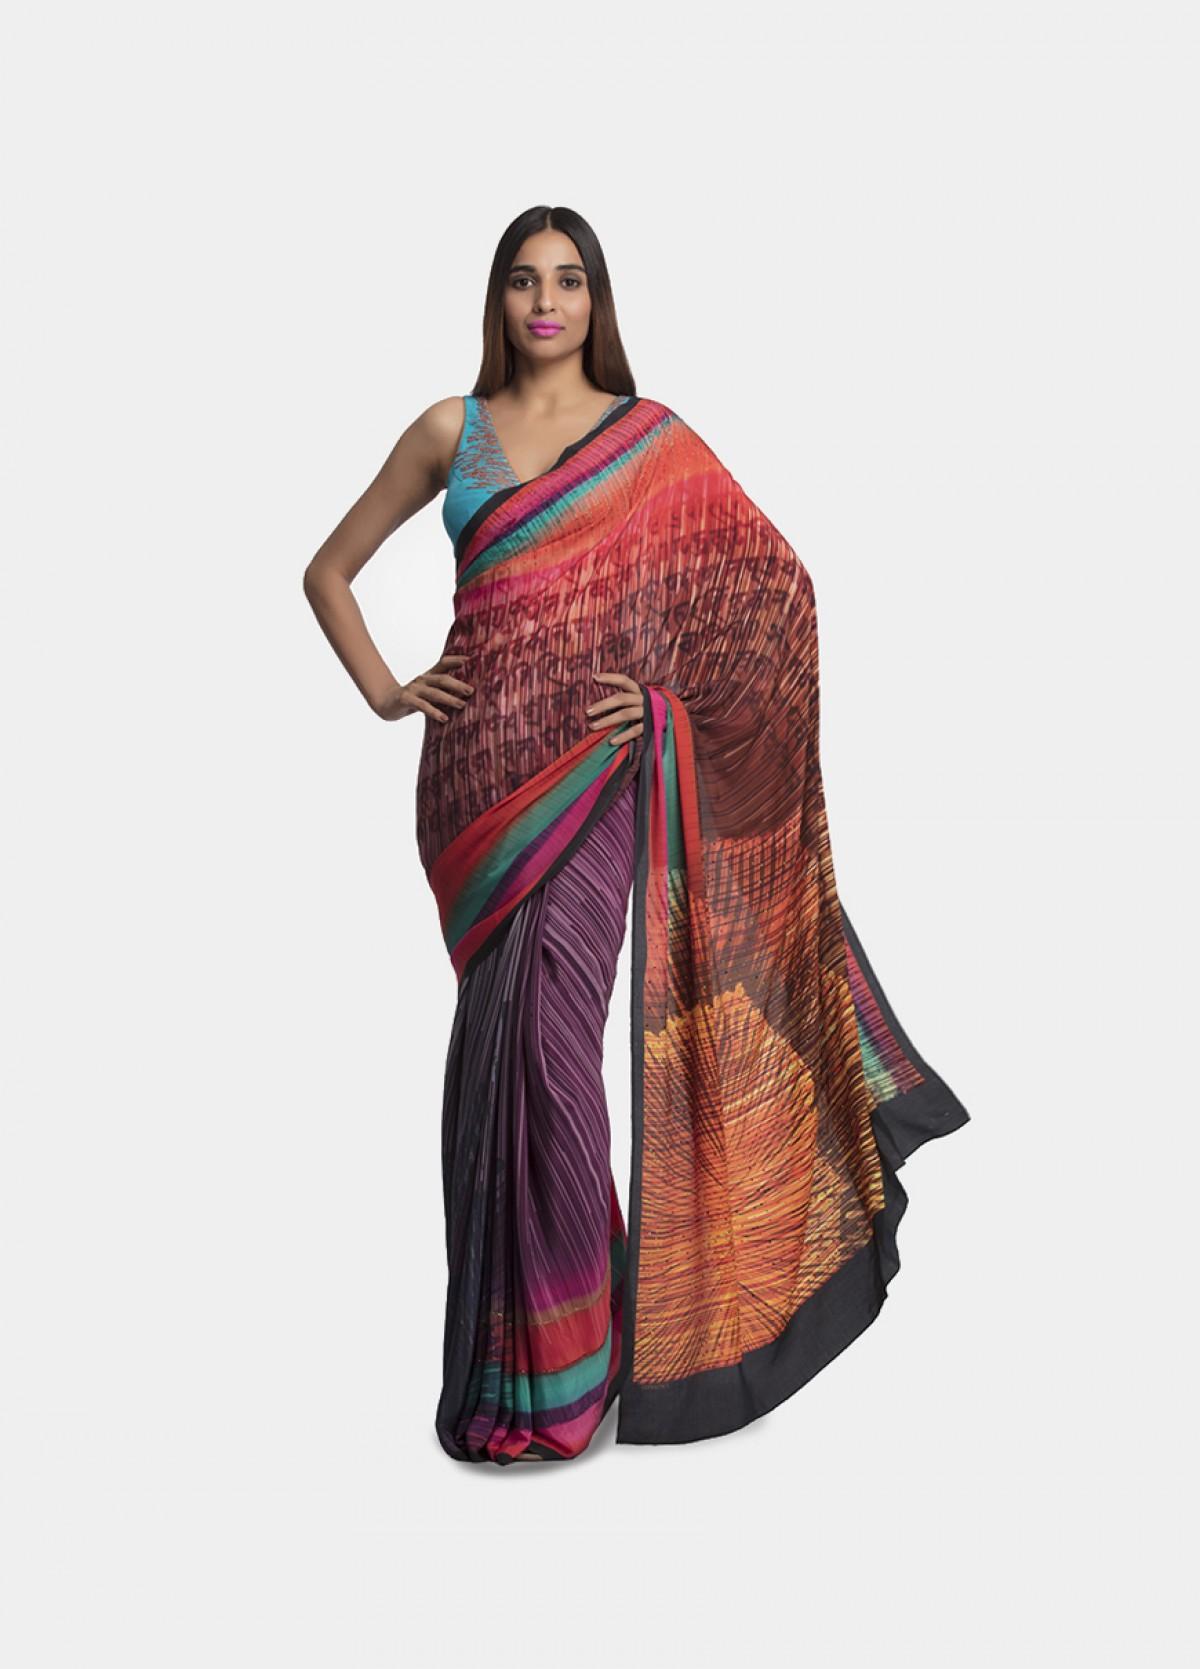 The Devak Sari